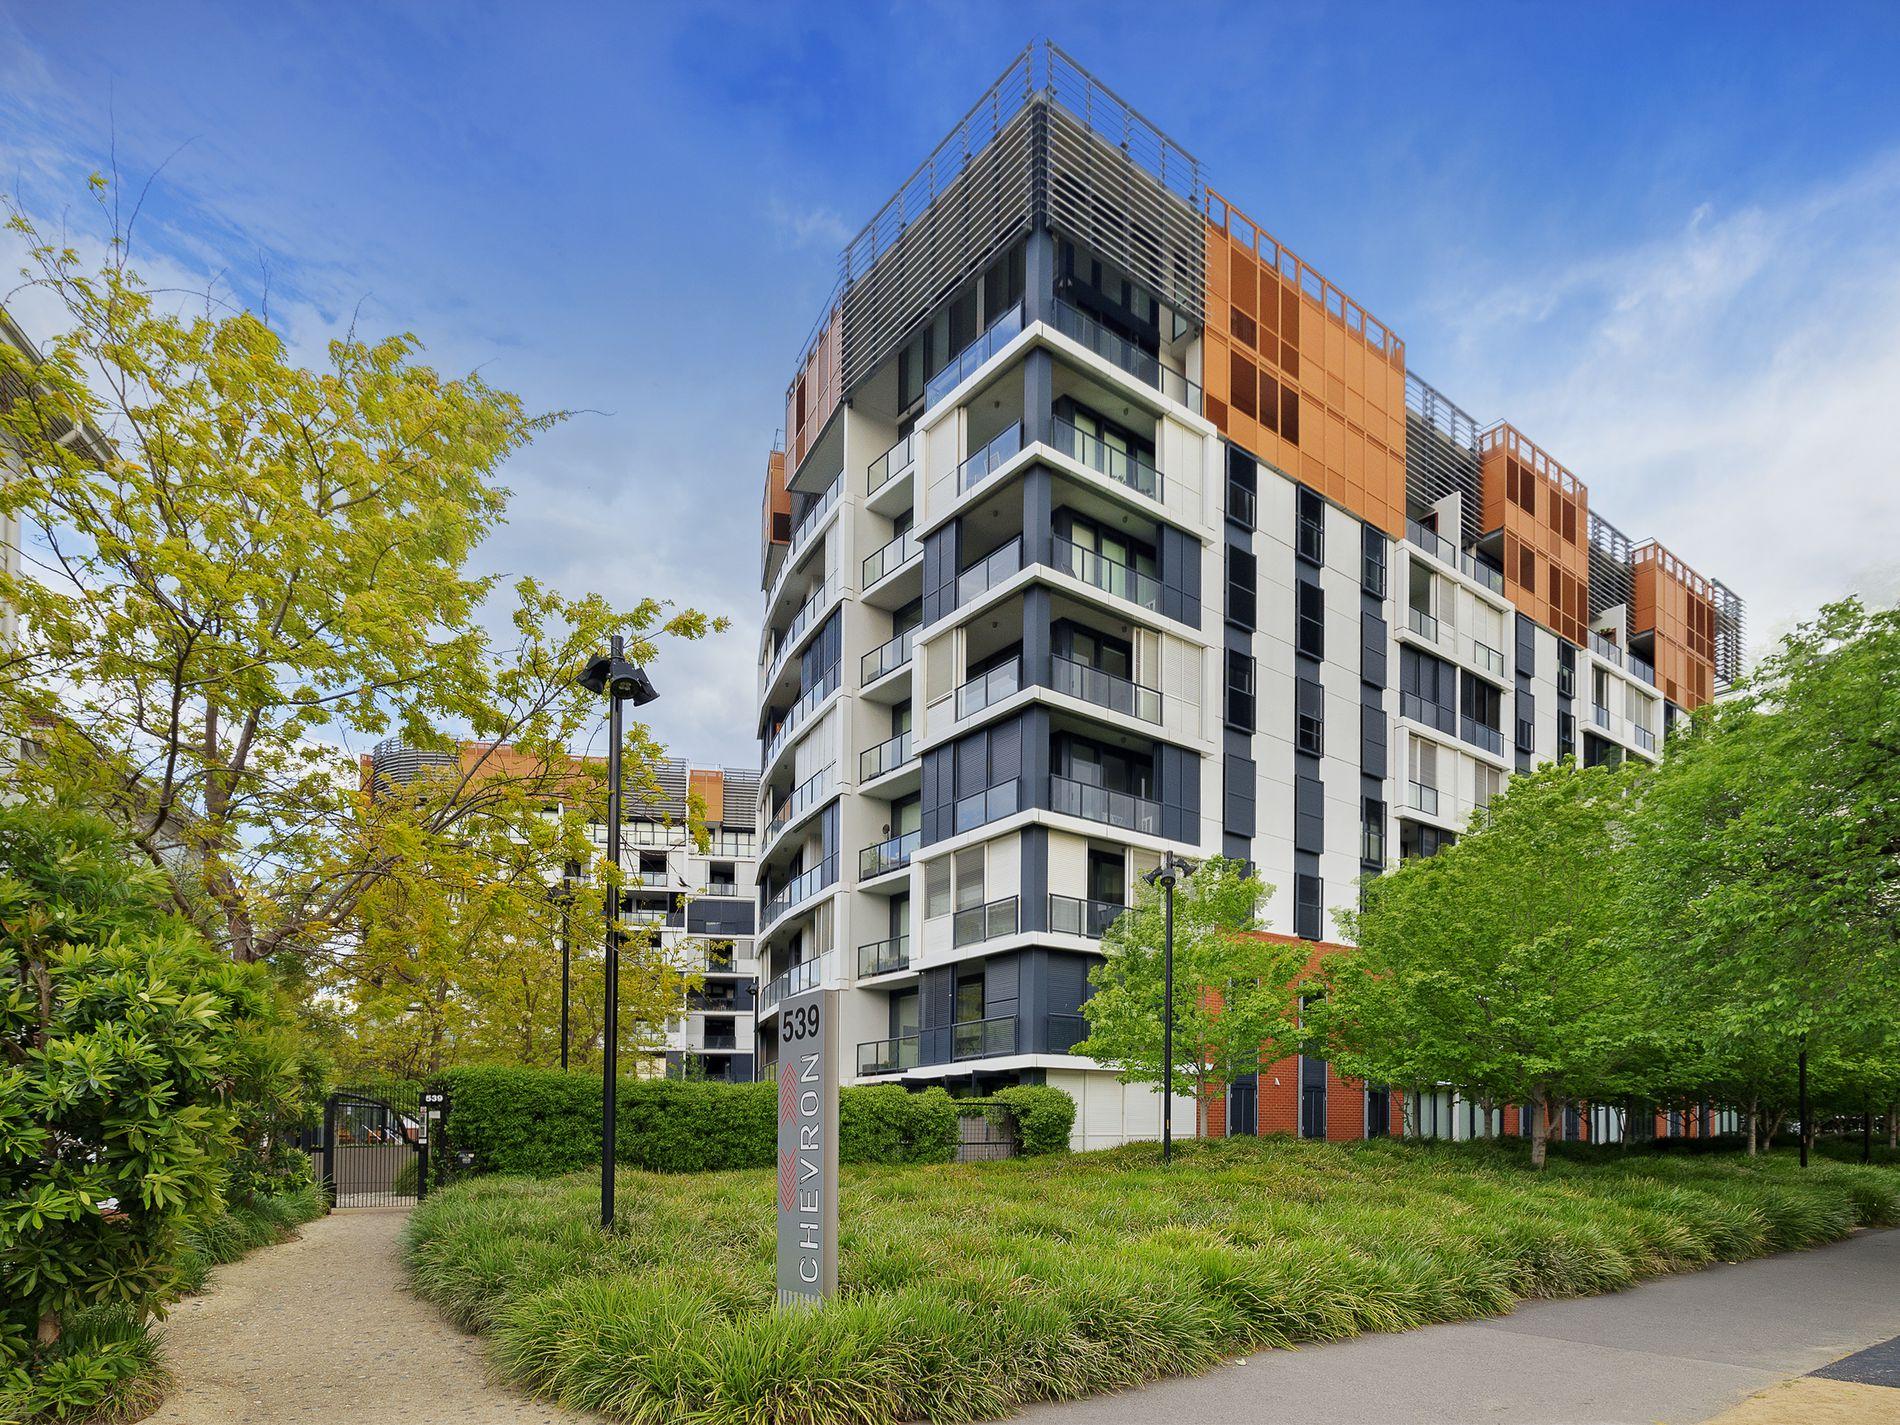 328 / 539 St Kilda Road, Melbourne